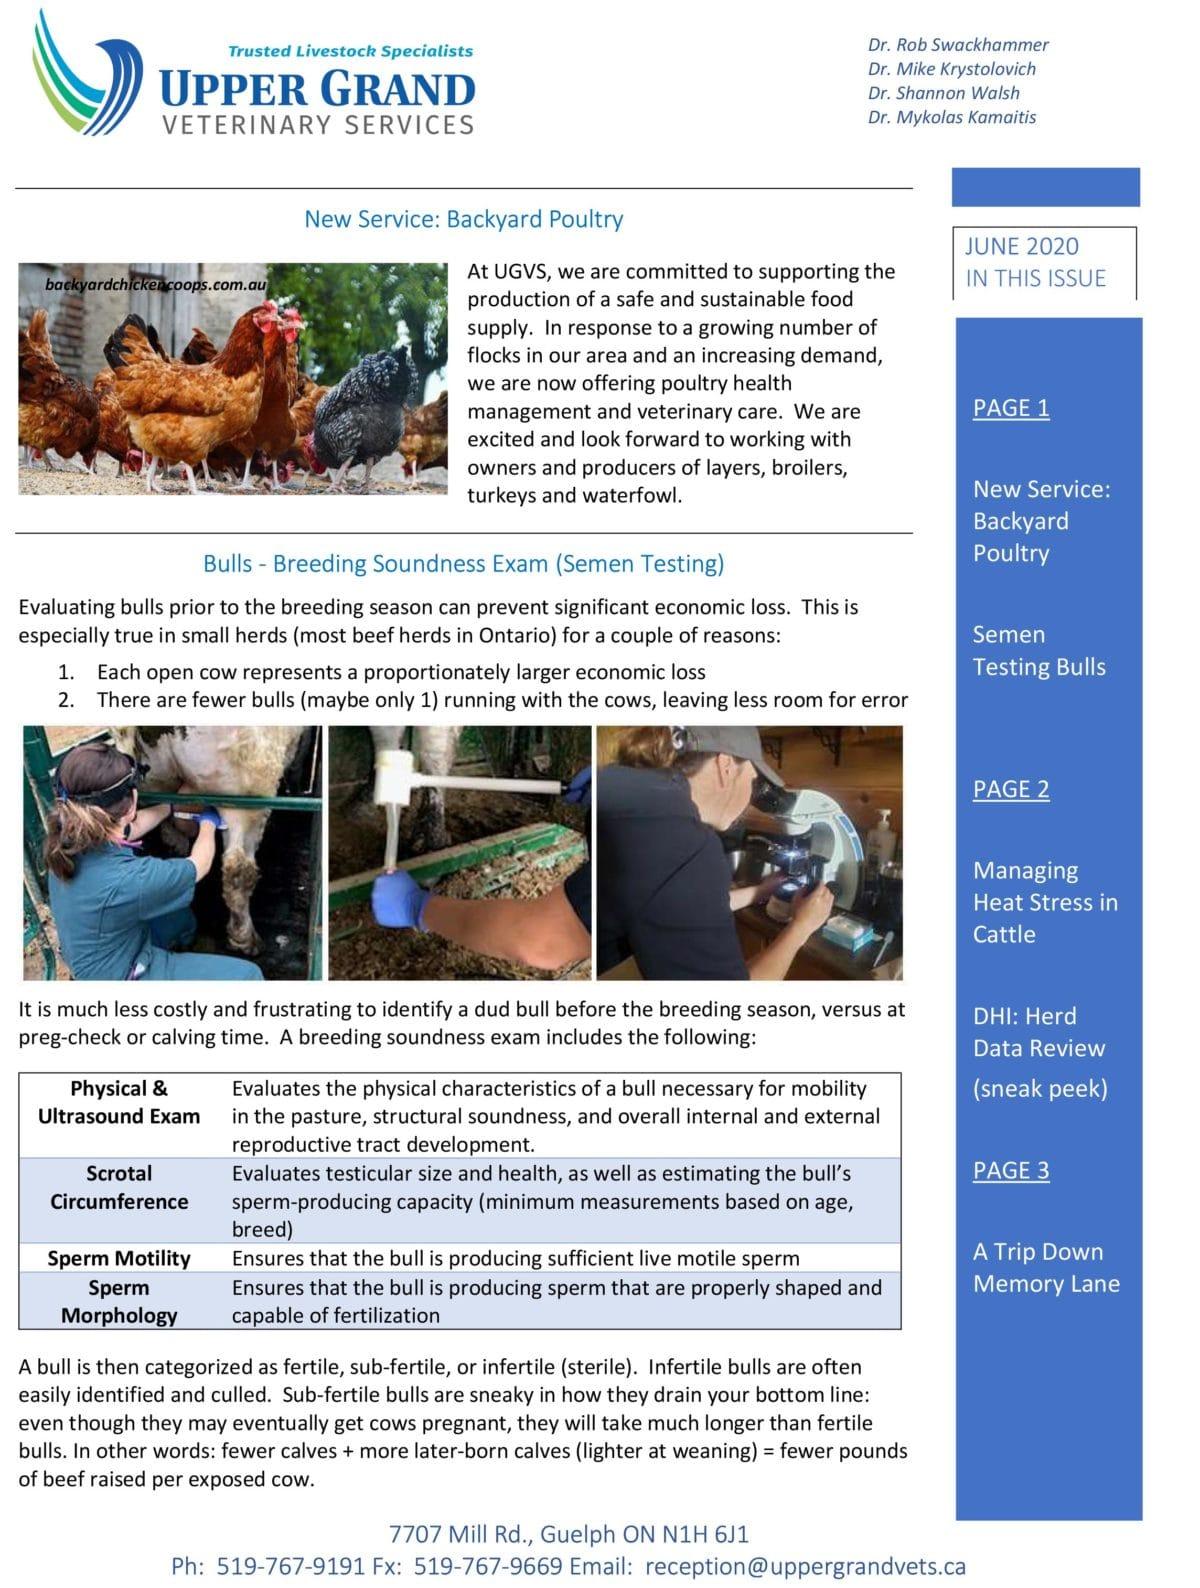 UGVS-Newsletter_June-2020-1-copy-1200x1588.jpg